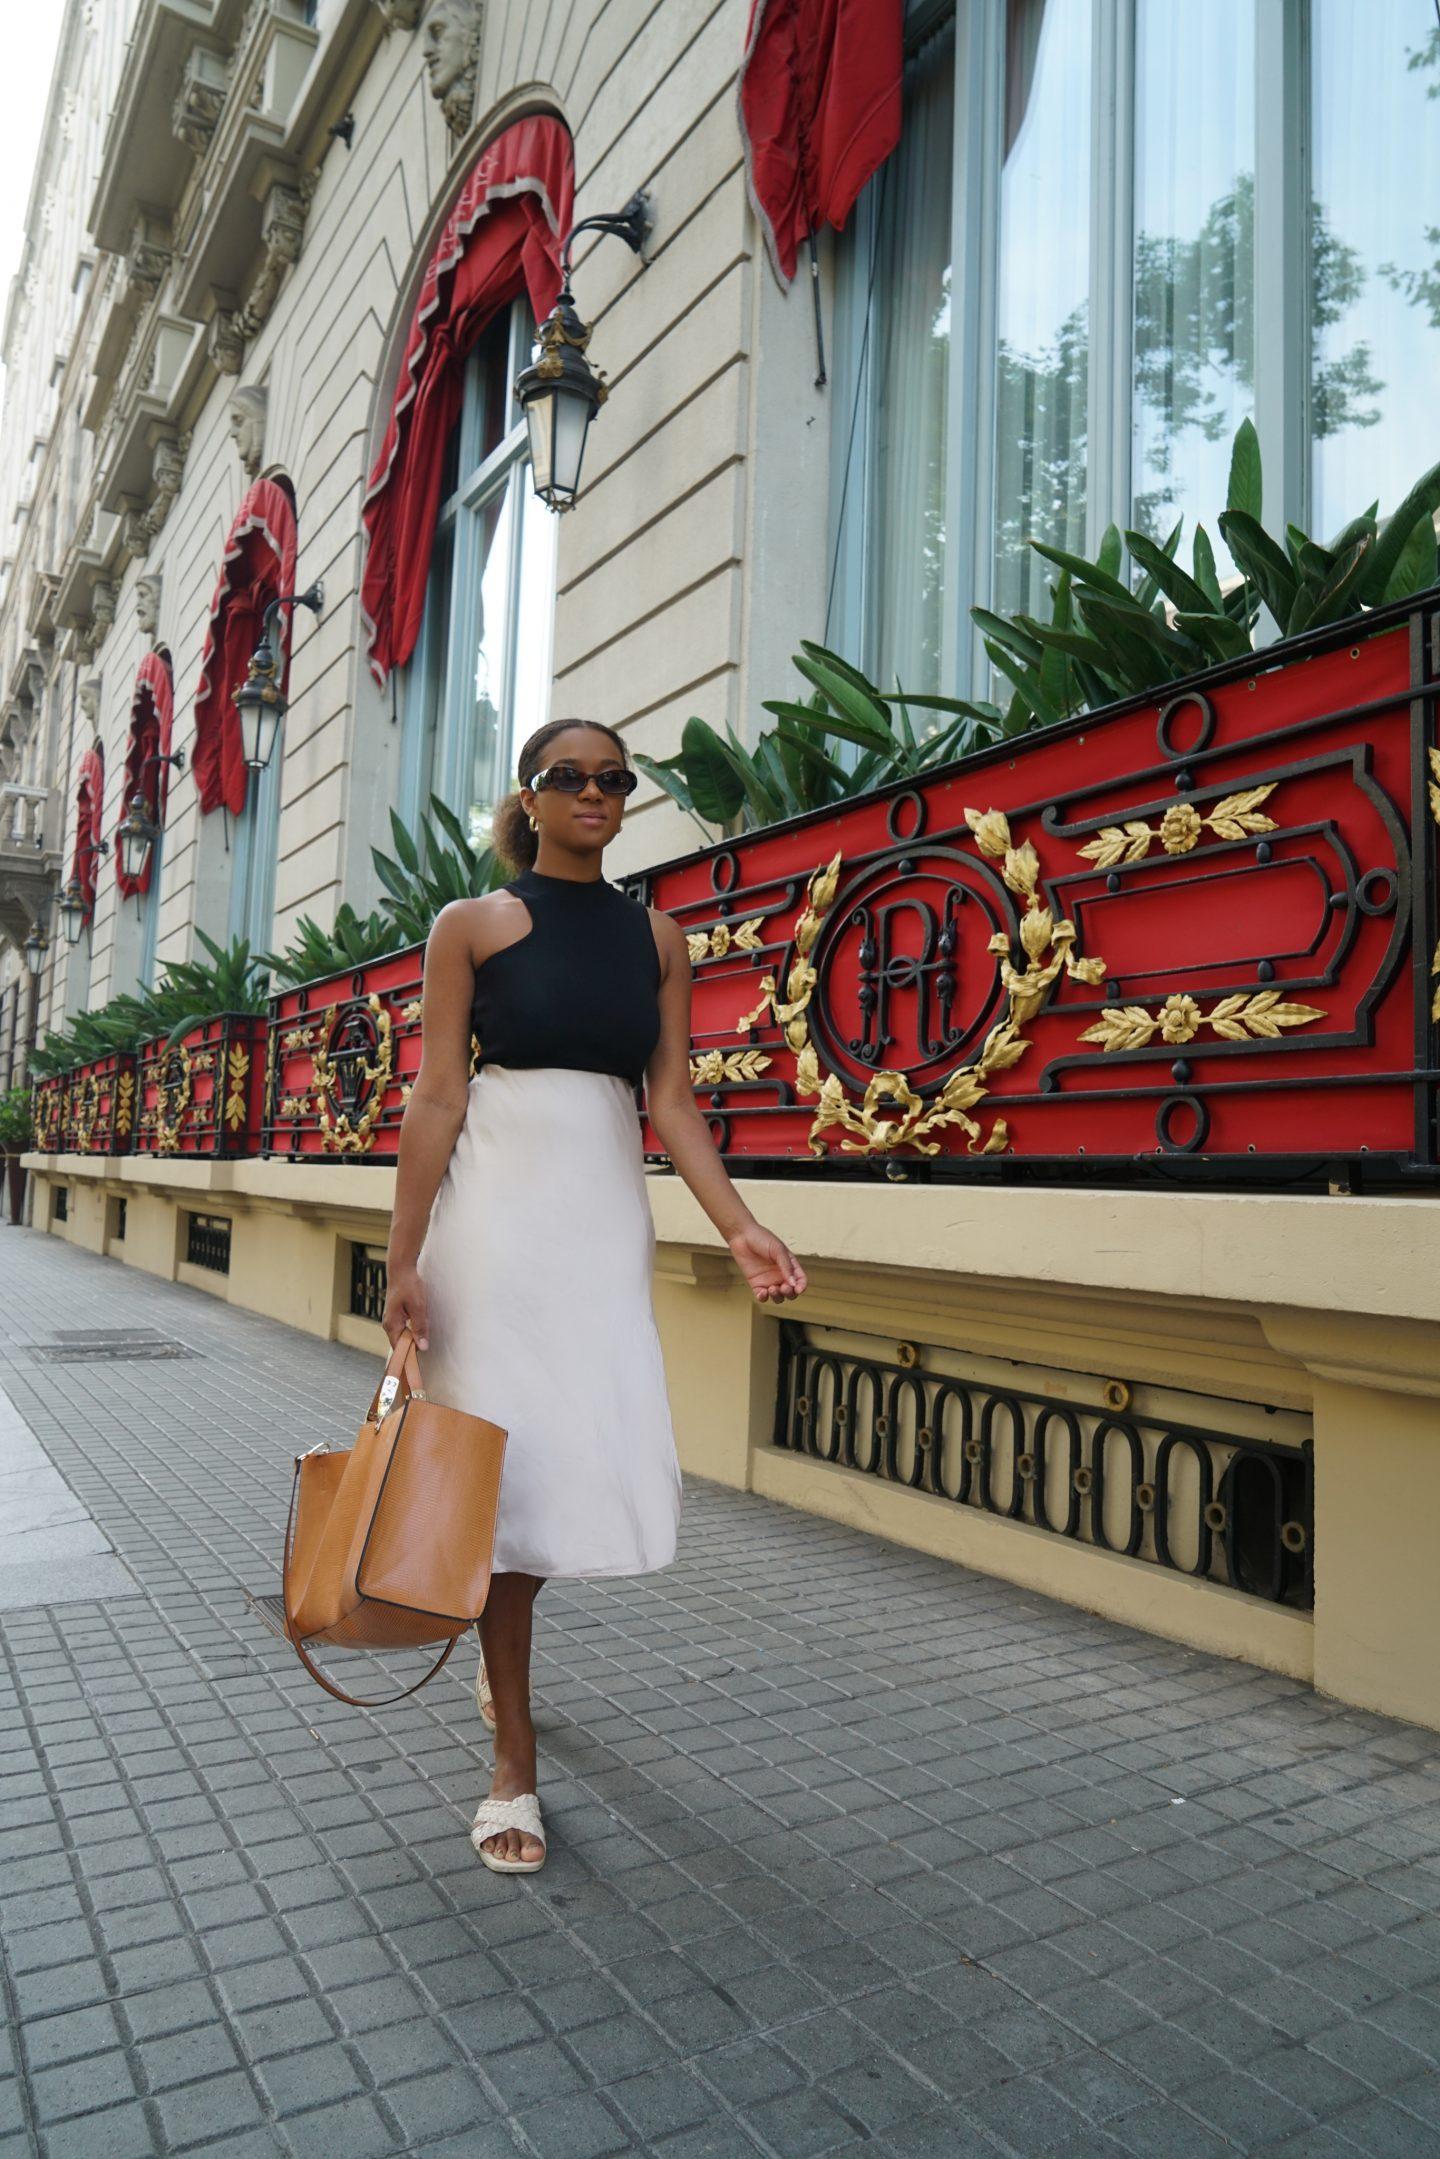 the palace hotel barcelona